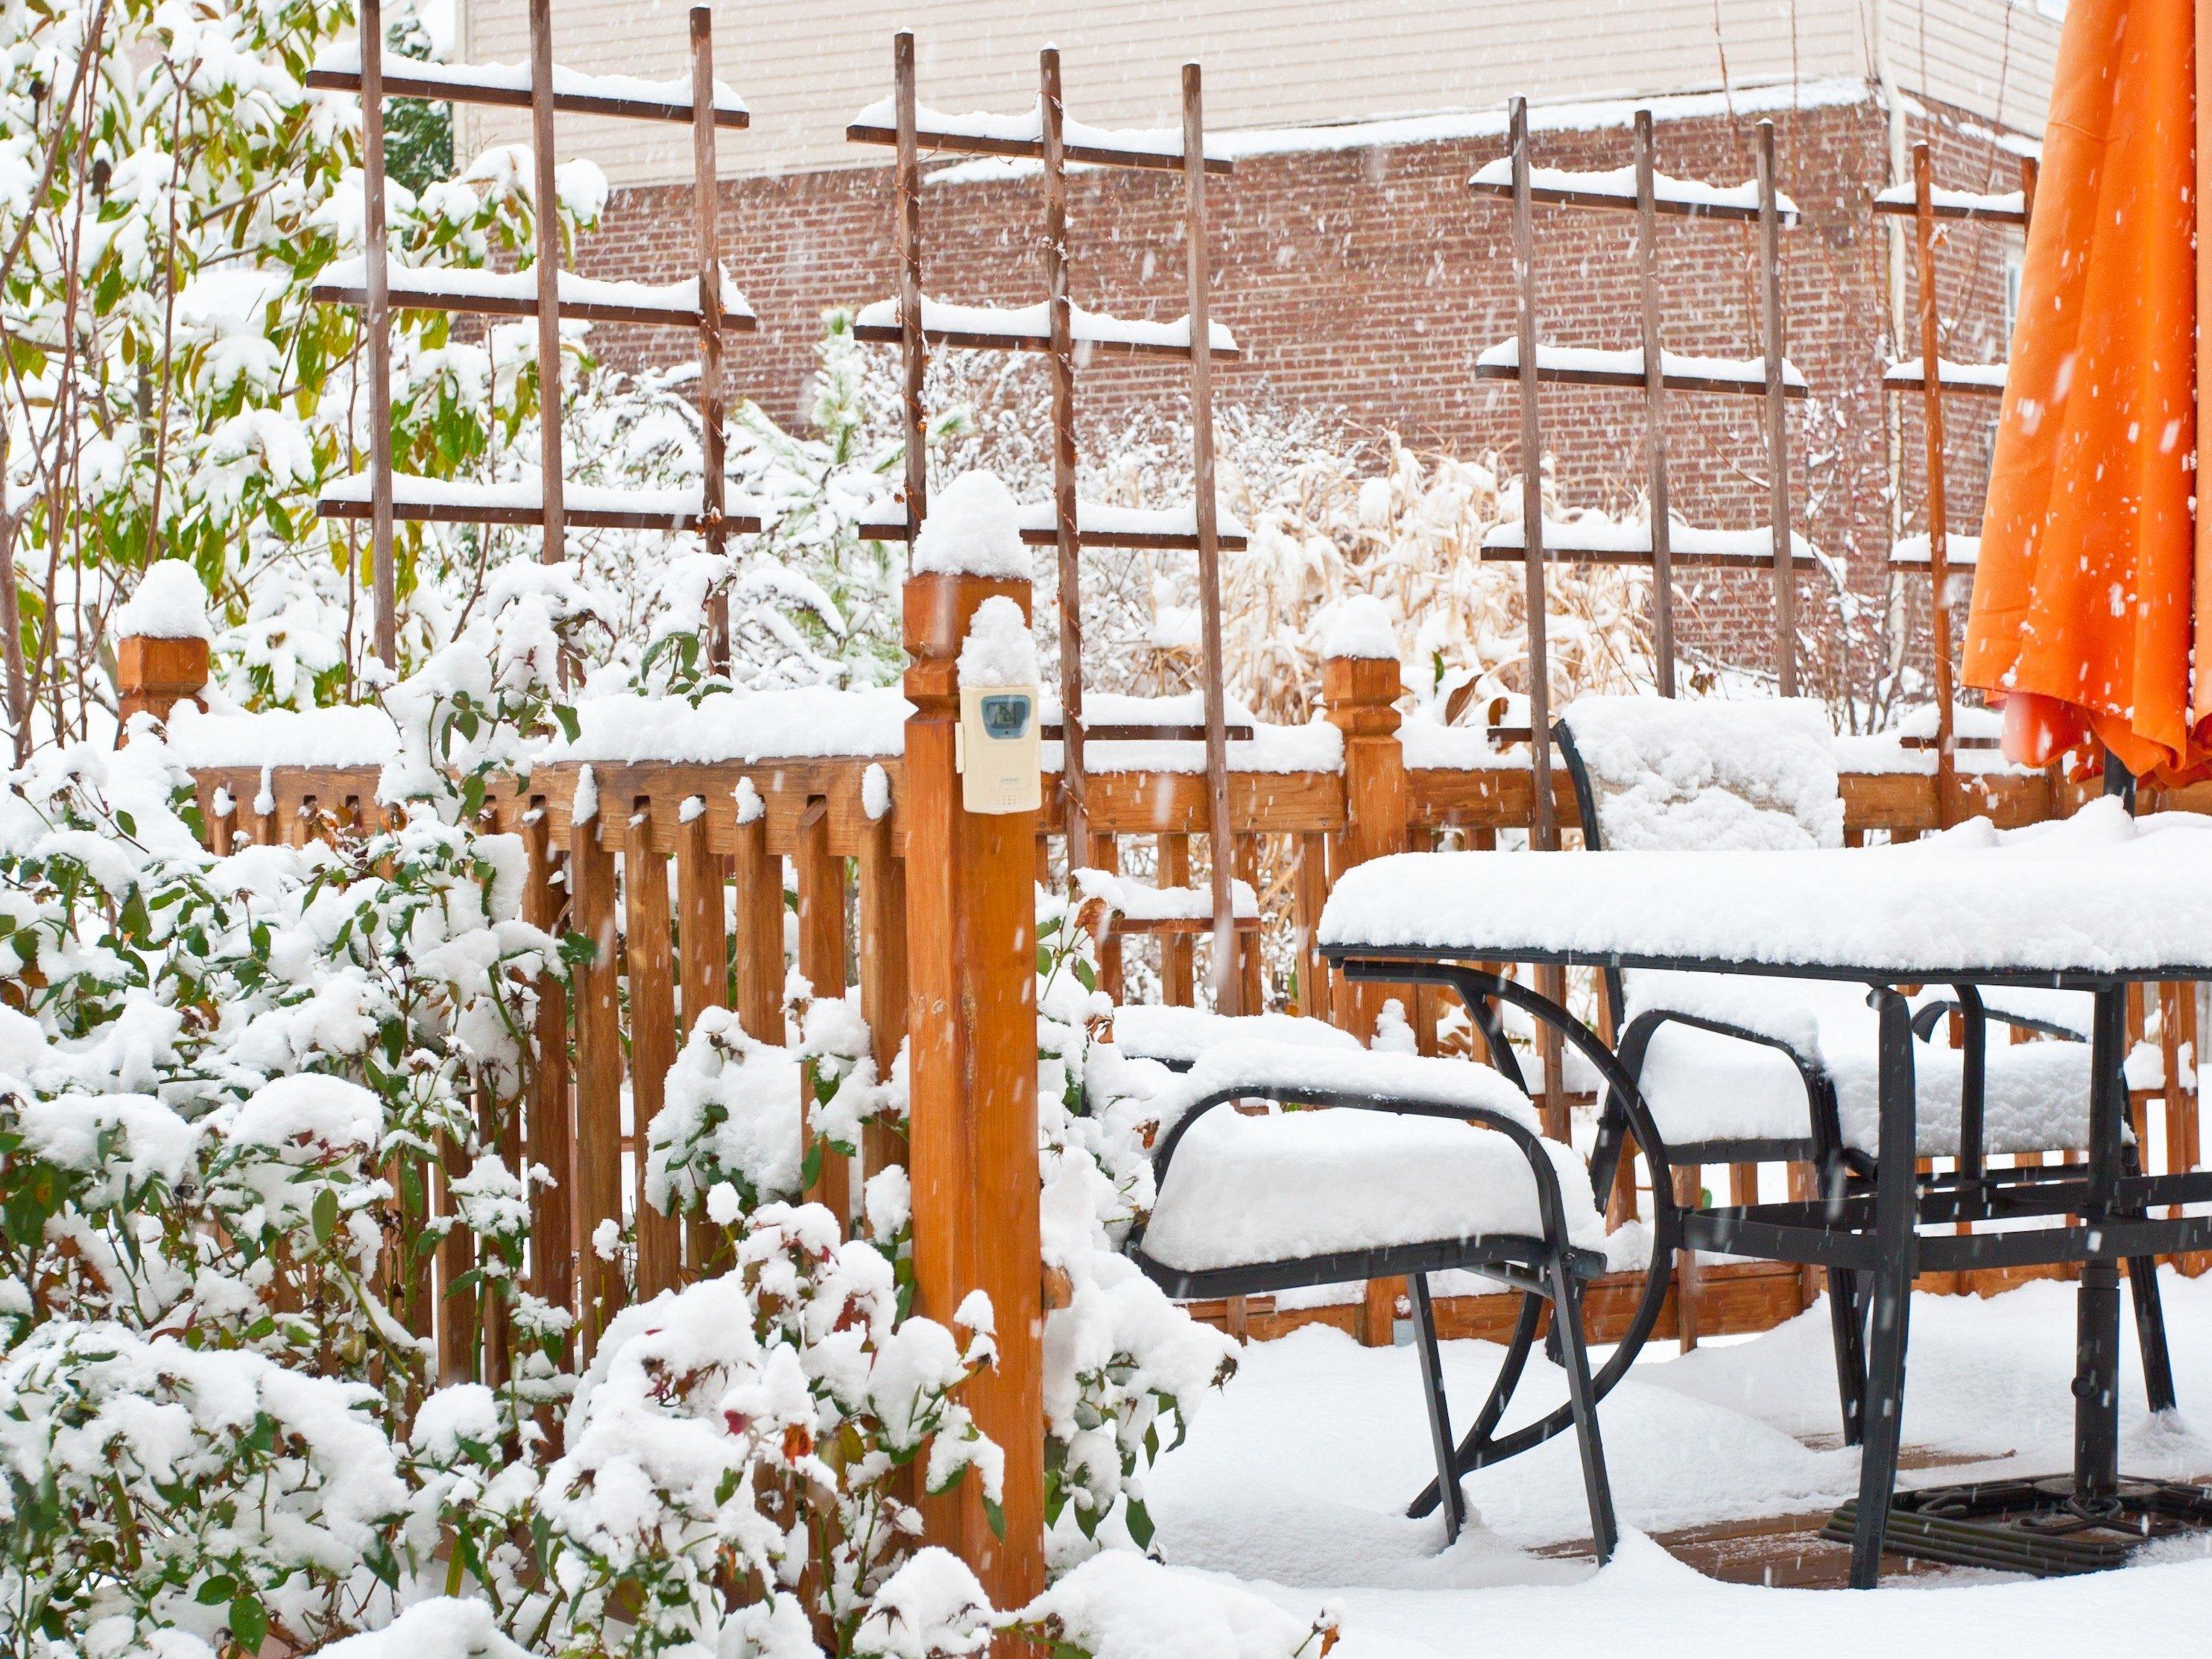 5. Winterize yard furniture and equipment.